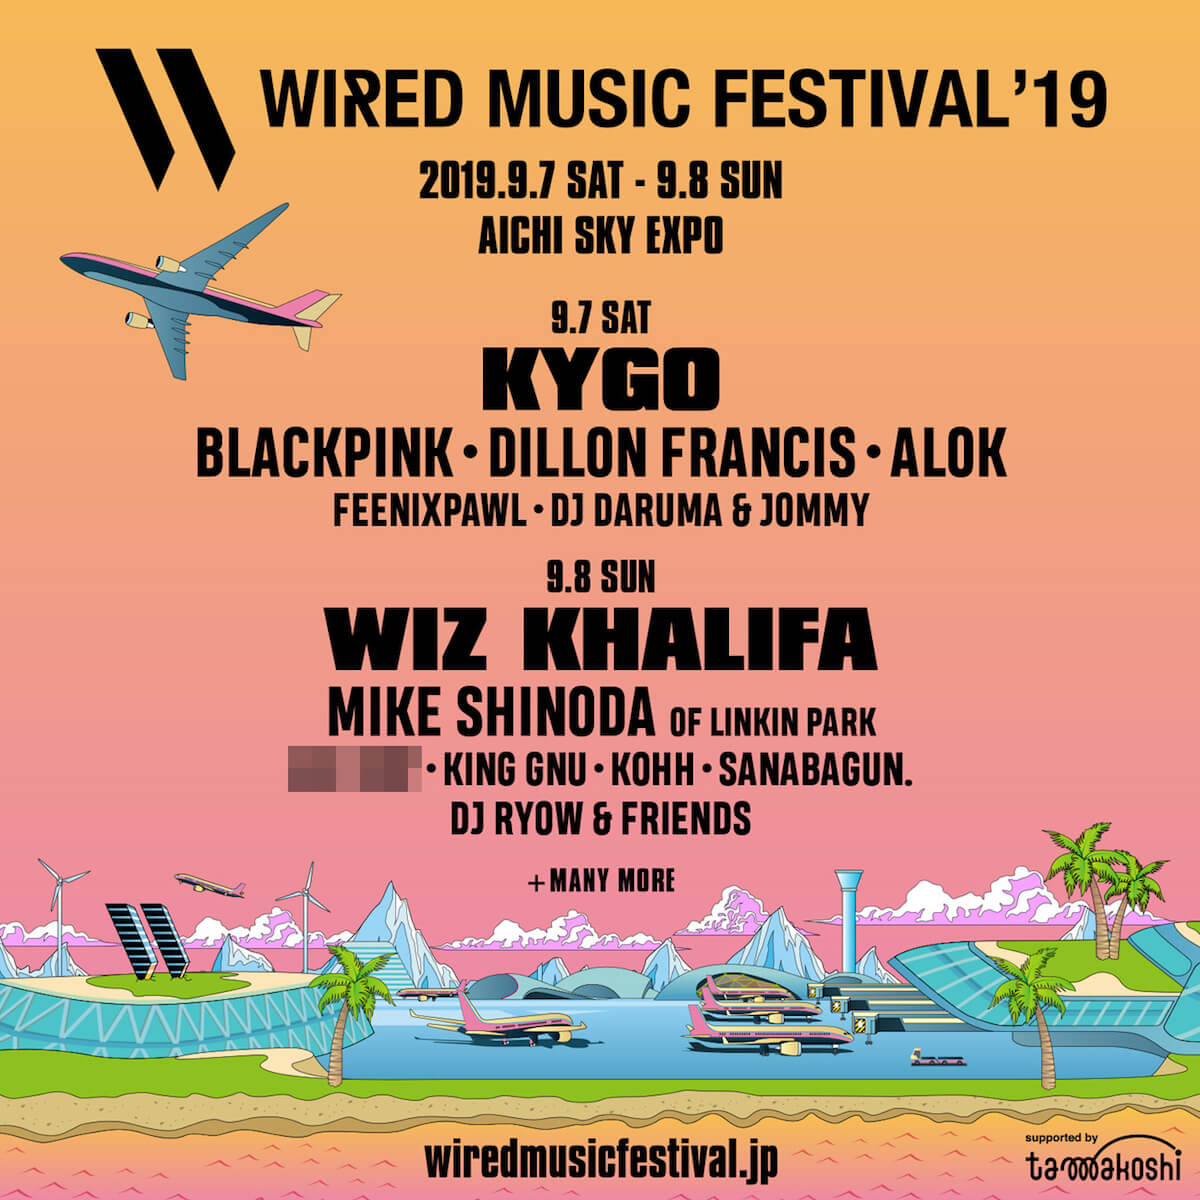 <WIRED MUSIC FESTIVAL '19>にBLACKPINK、King Gnu、KOHHら出演決定! music190530_wiredmusicfestival_main